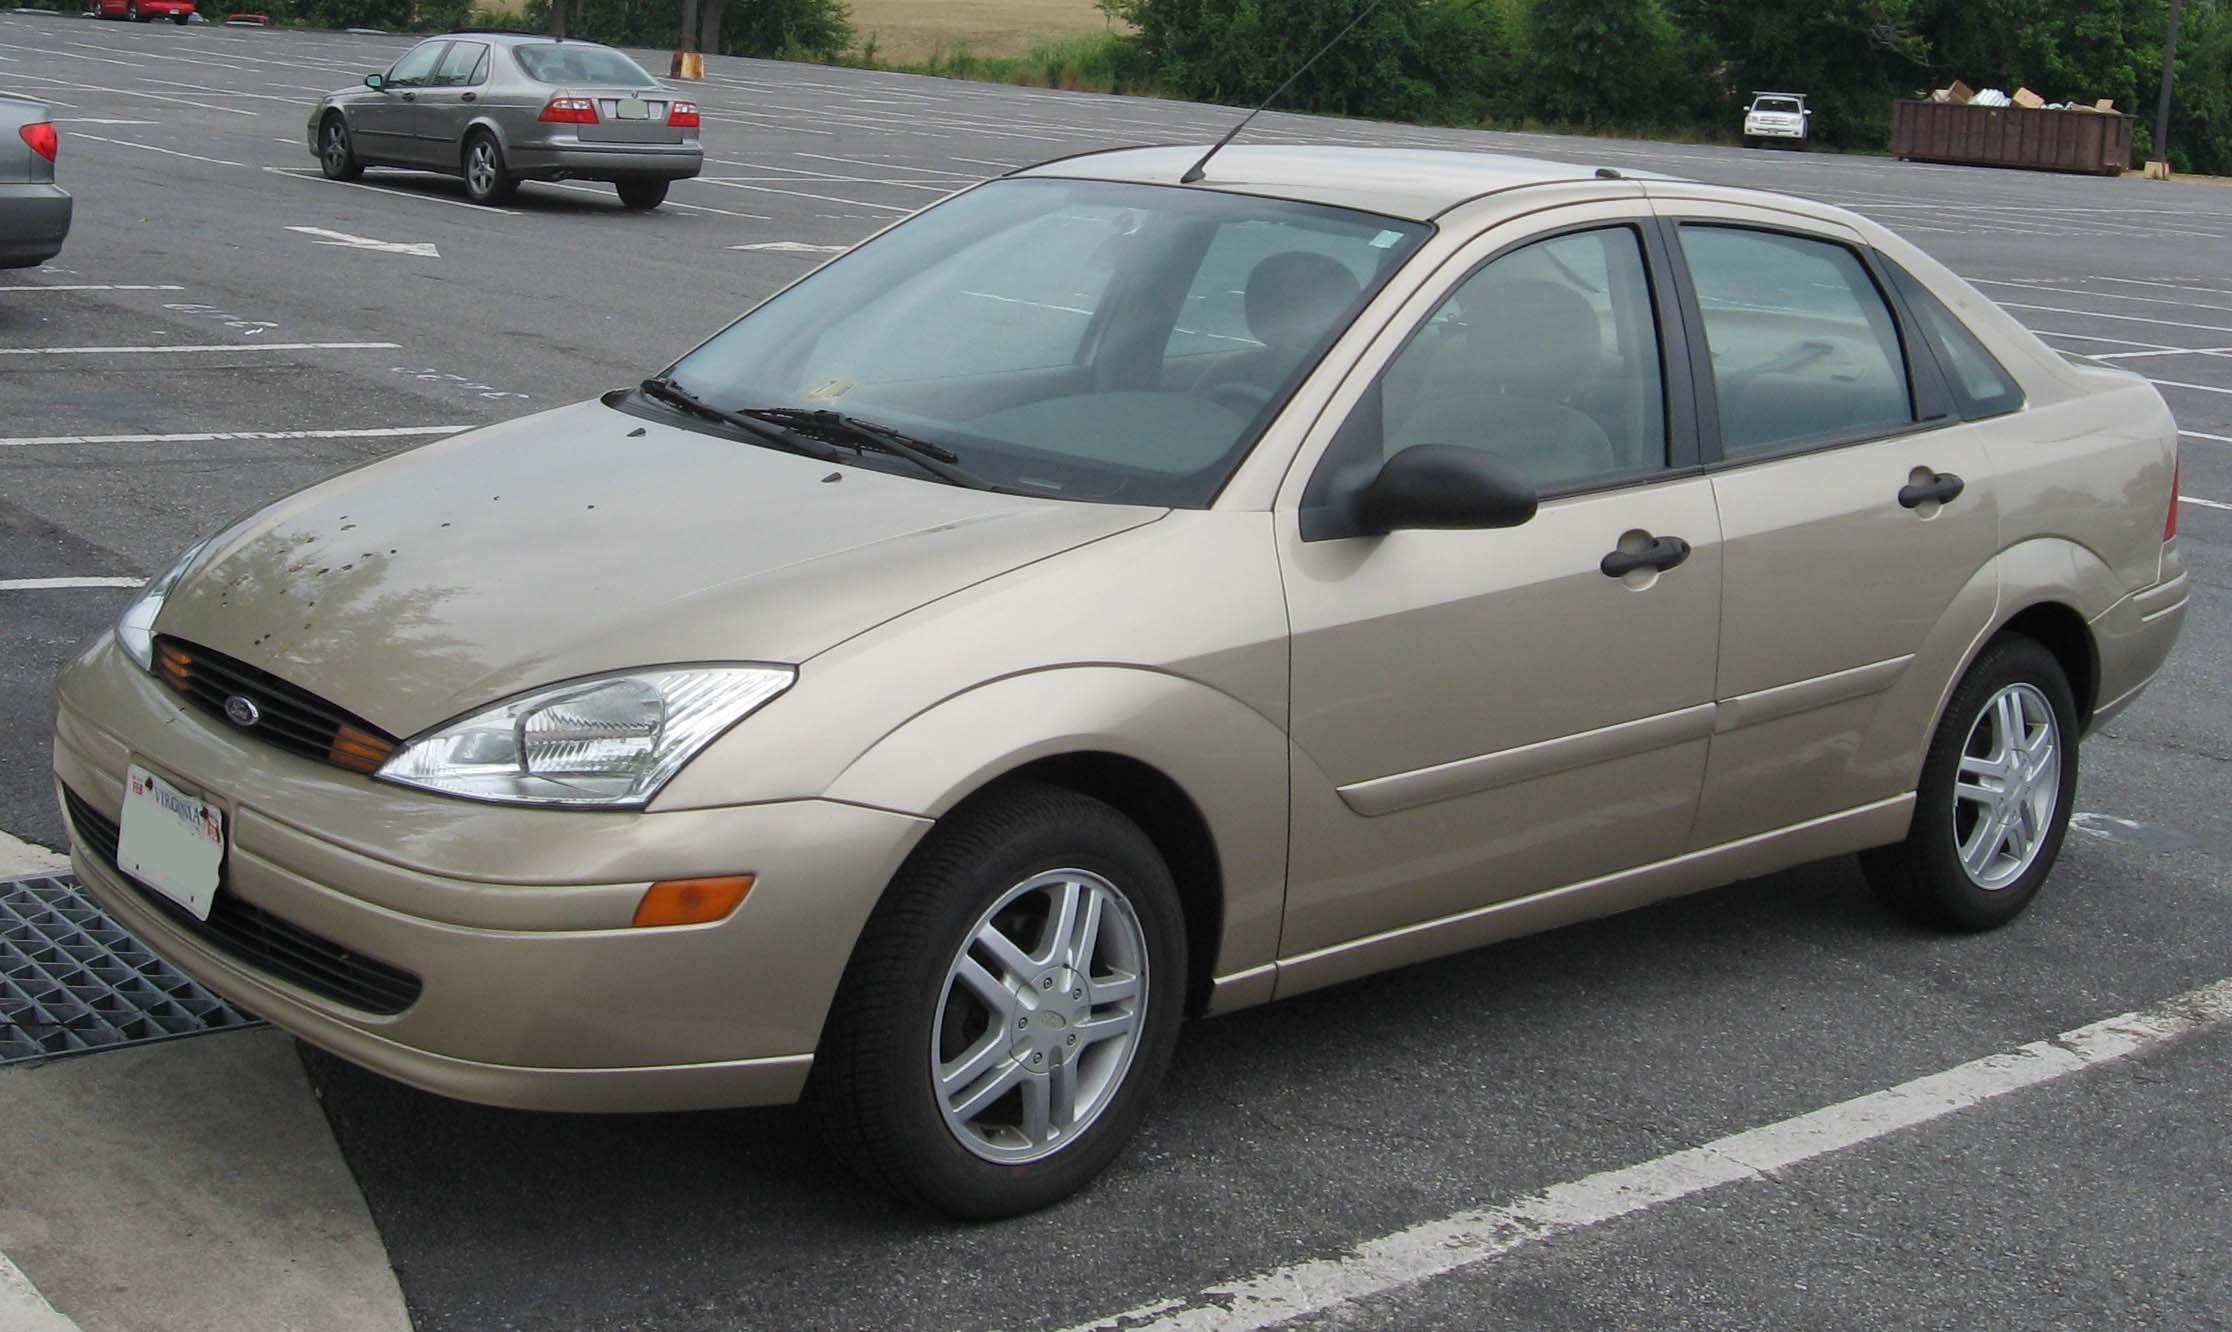 2007 Ford Focus FMV